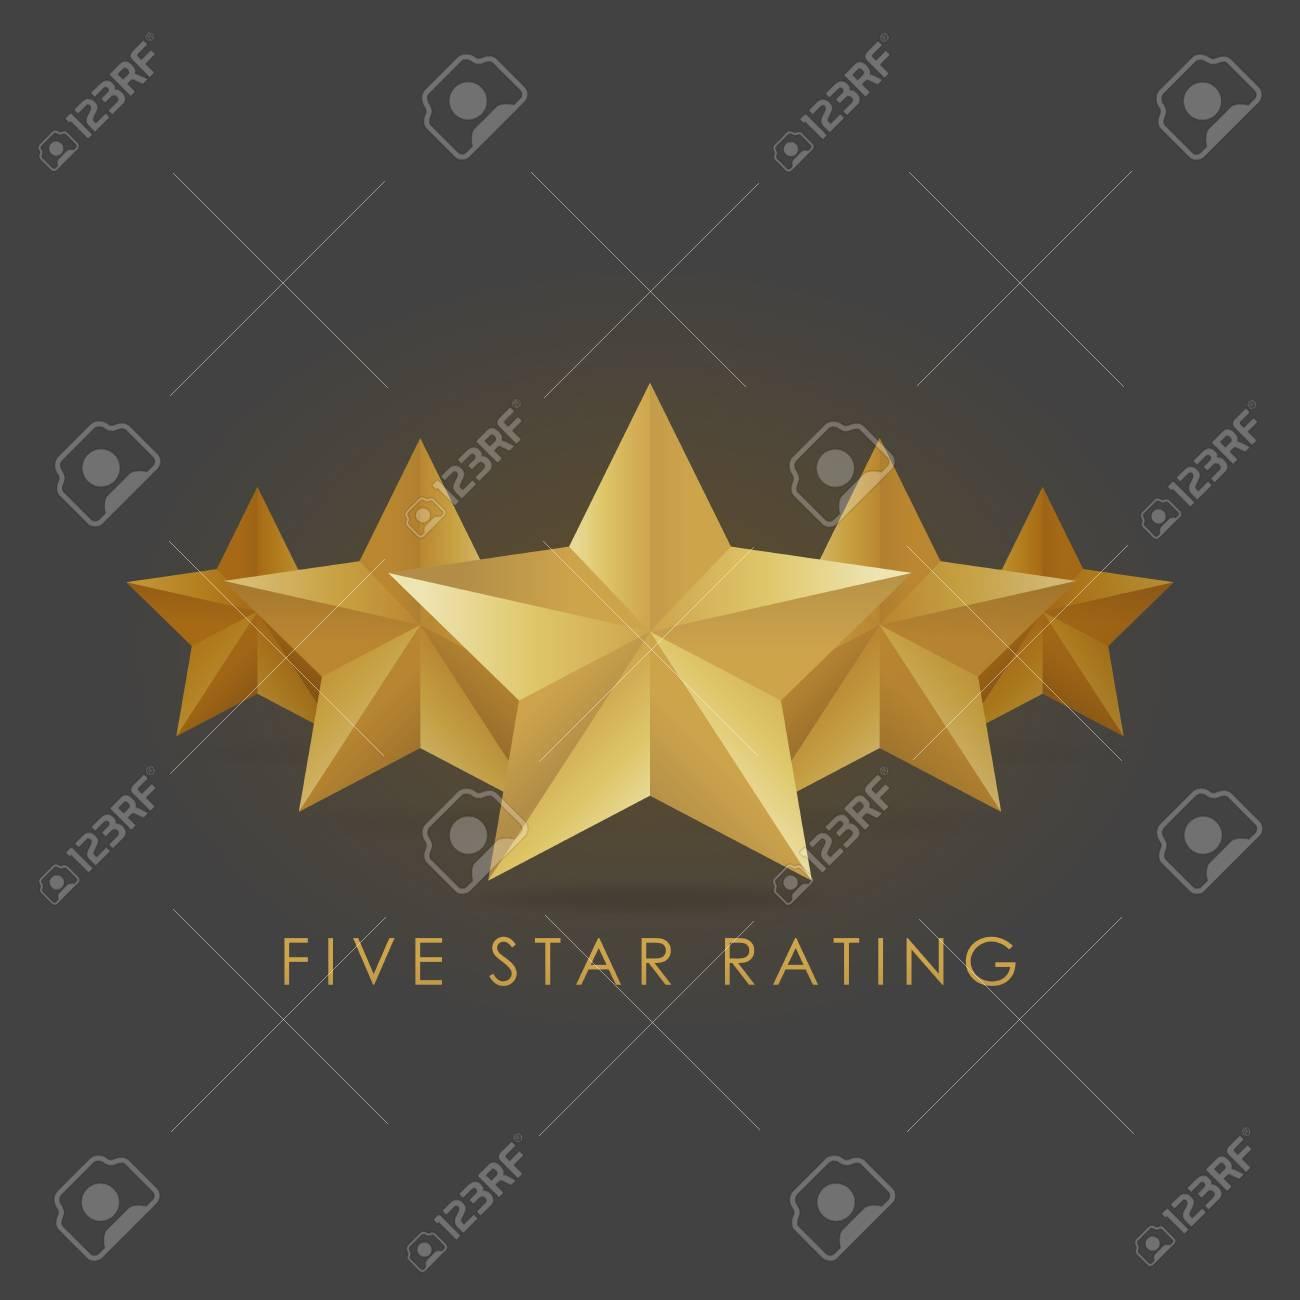 Five golden rating star vector illustration in gray black background. - 71509795